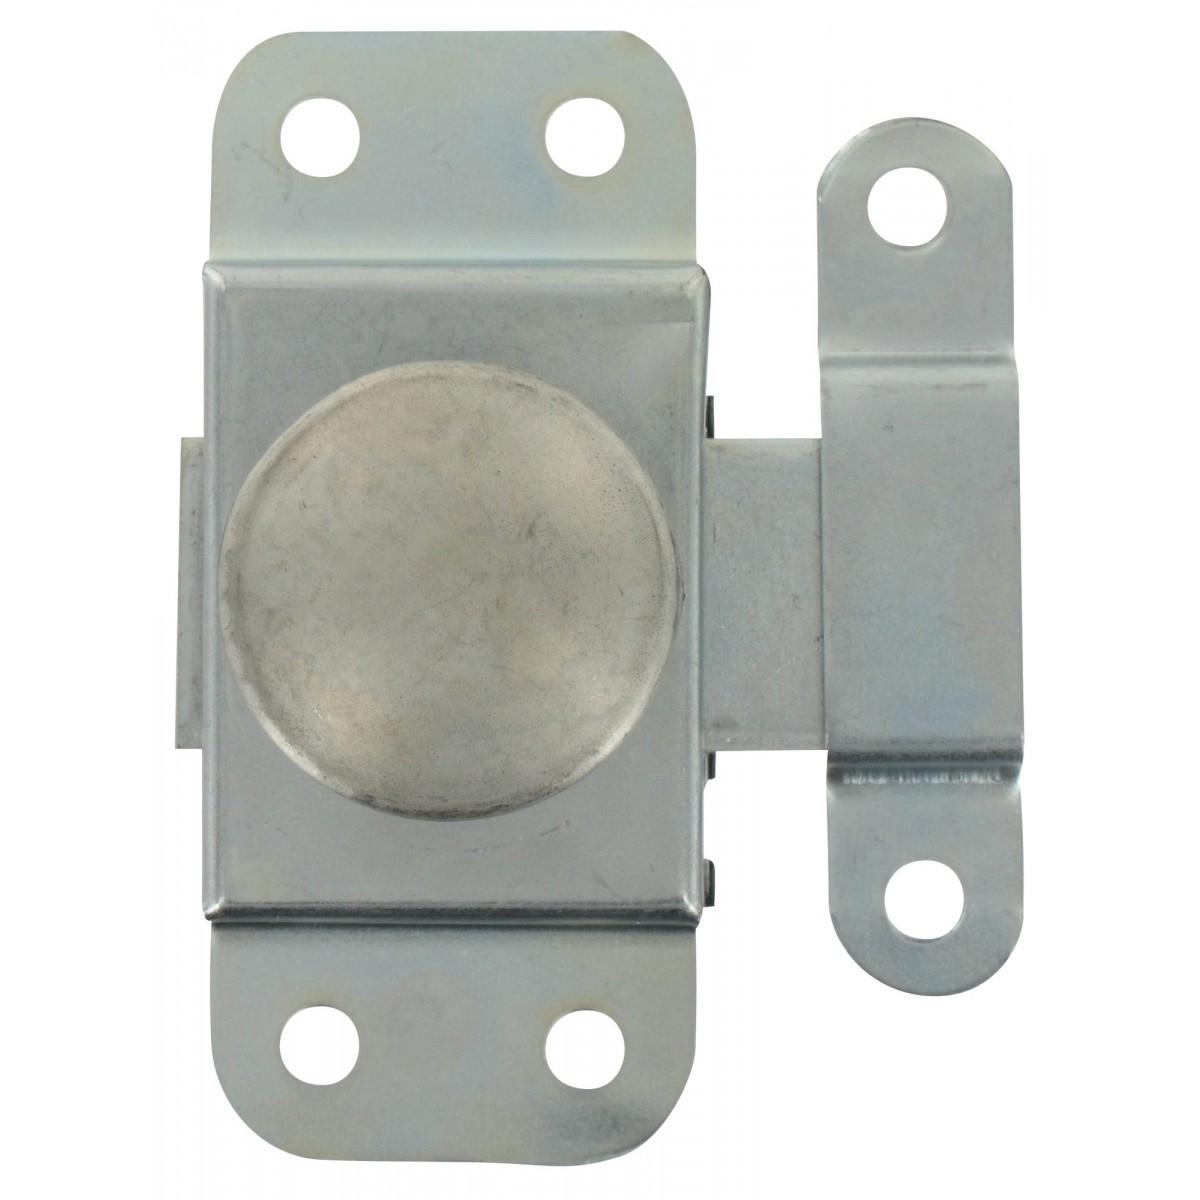 Targette bouton tournant acier Strauss Vonderweidt - Zingué - Longueur 30 mm